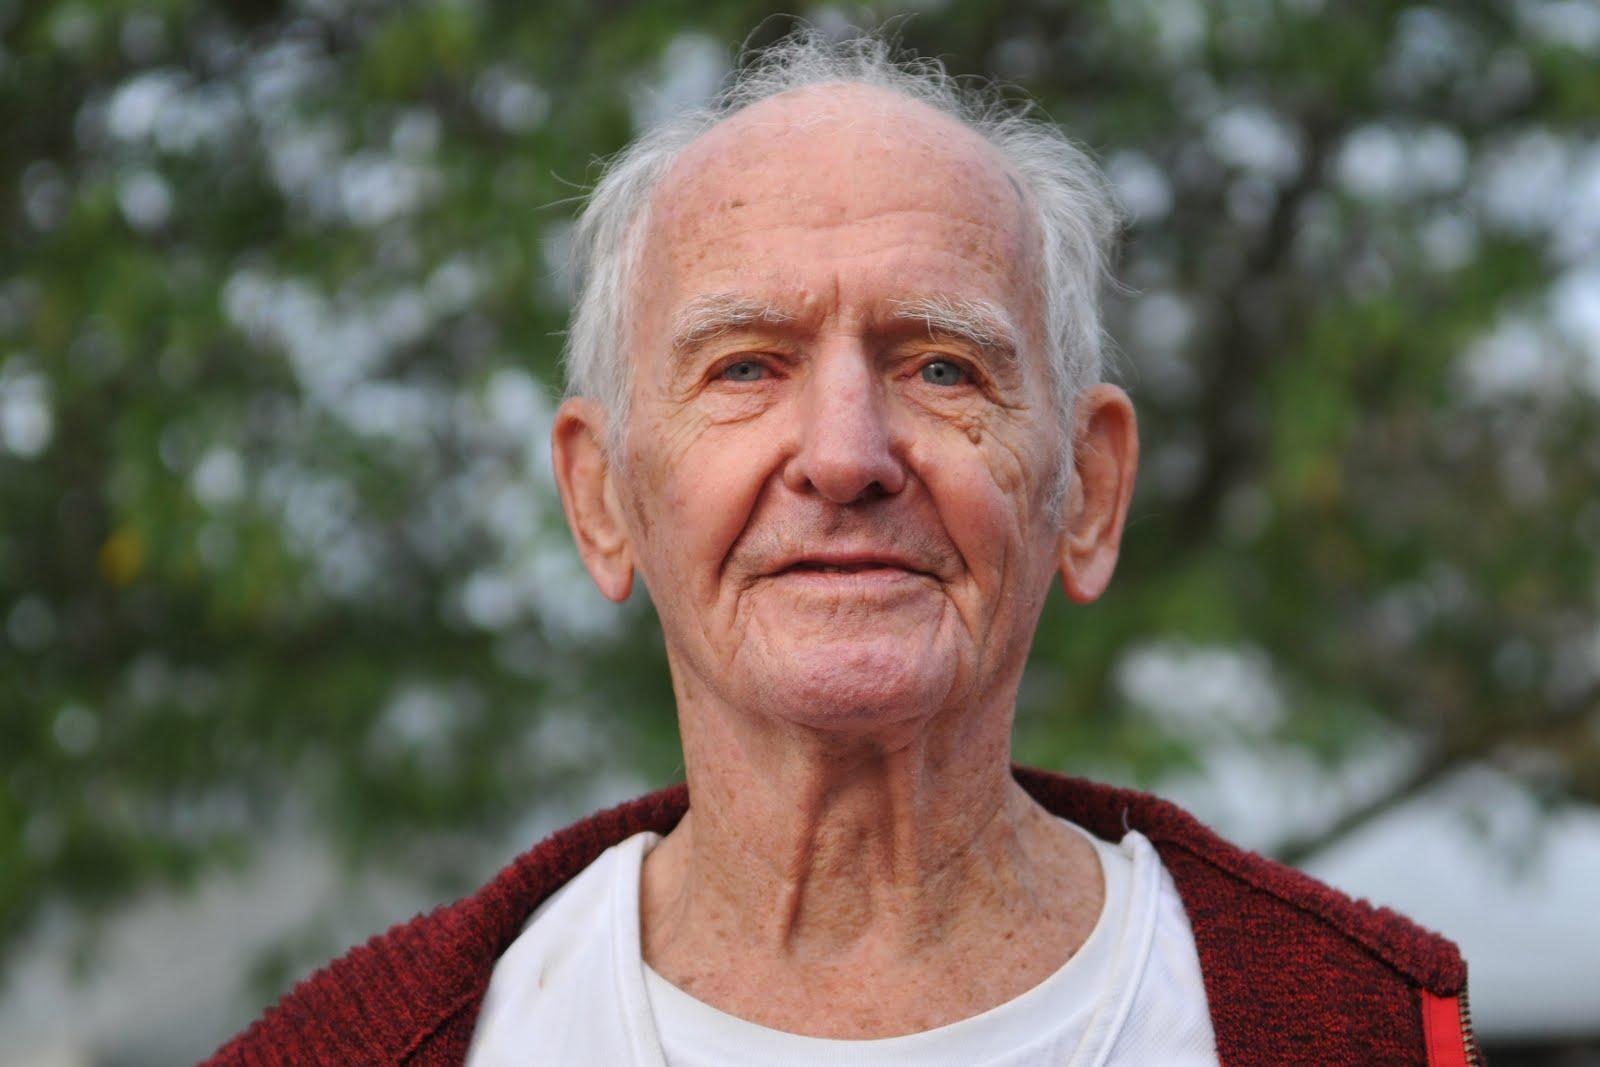 dating 70 year old man Gribskov